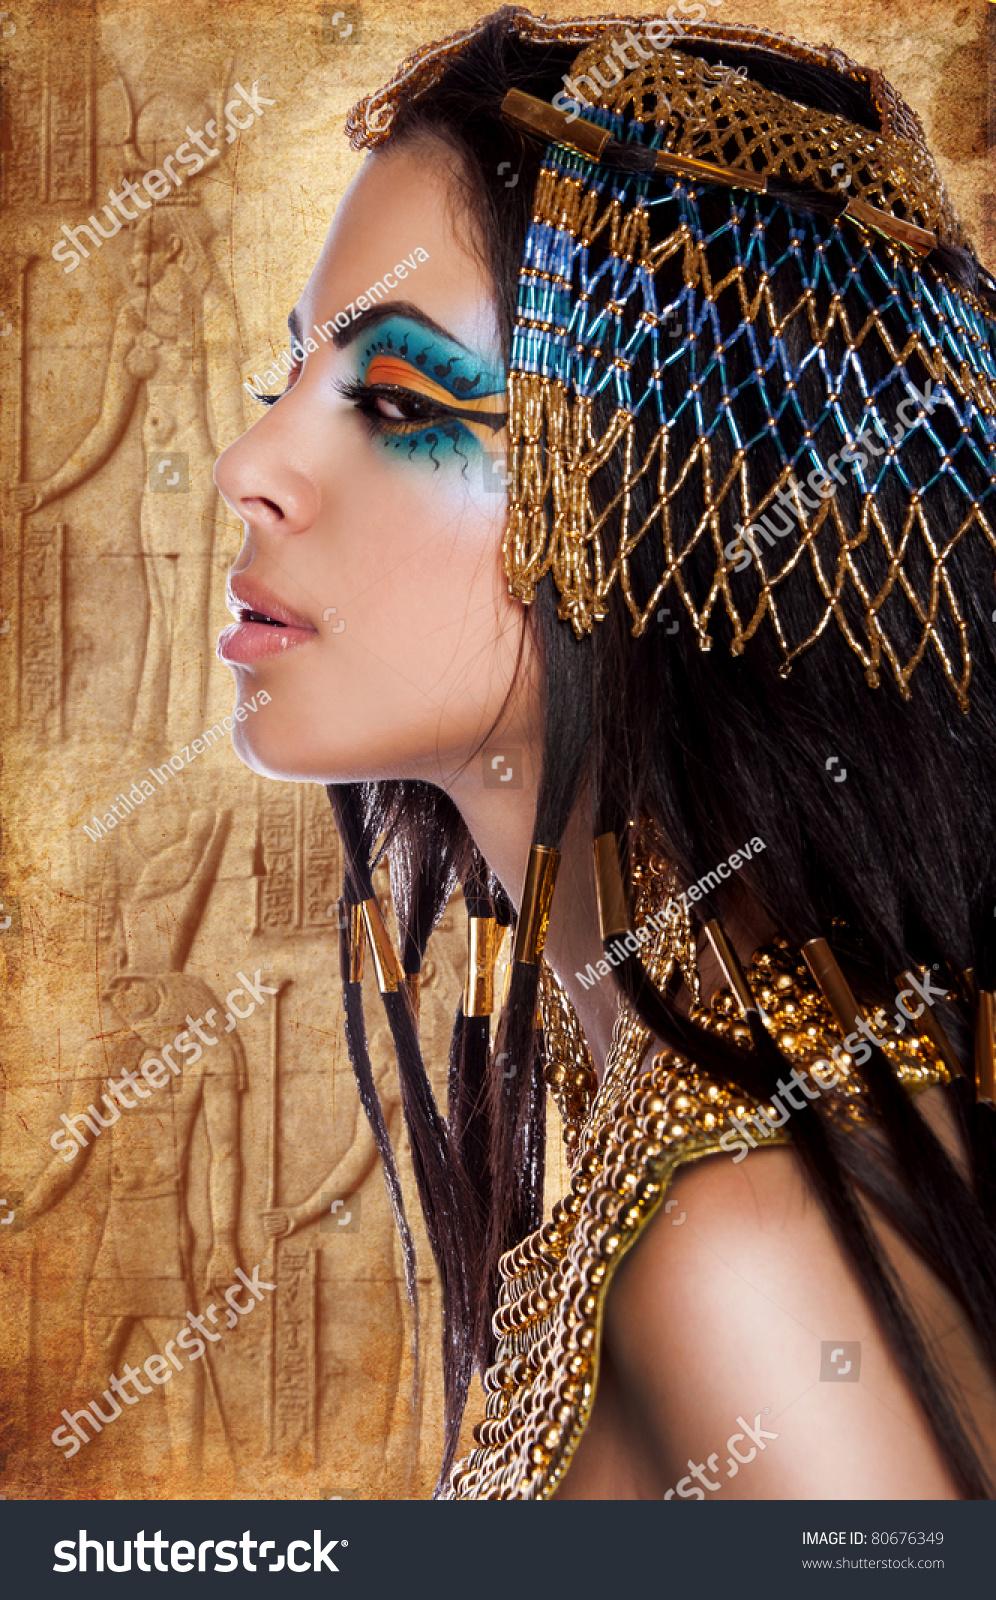 Egyptian Women Pics 71